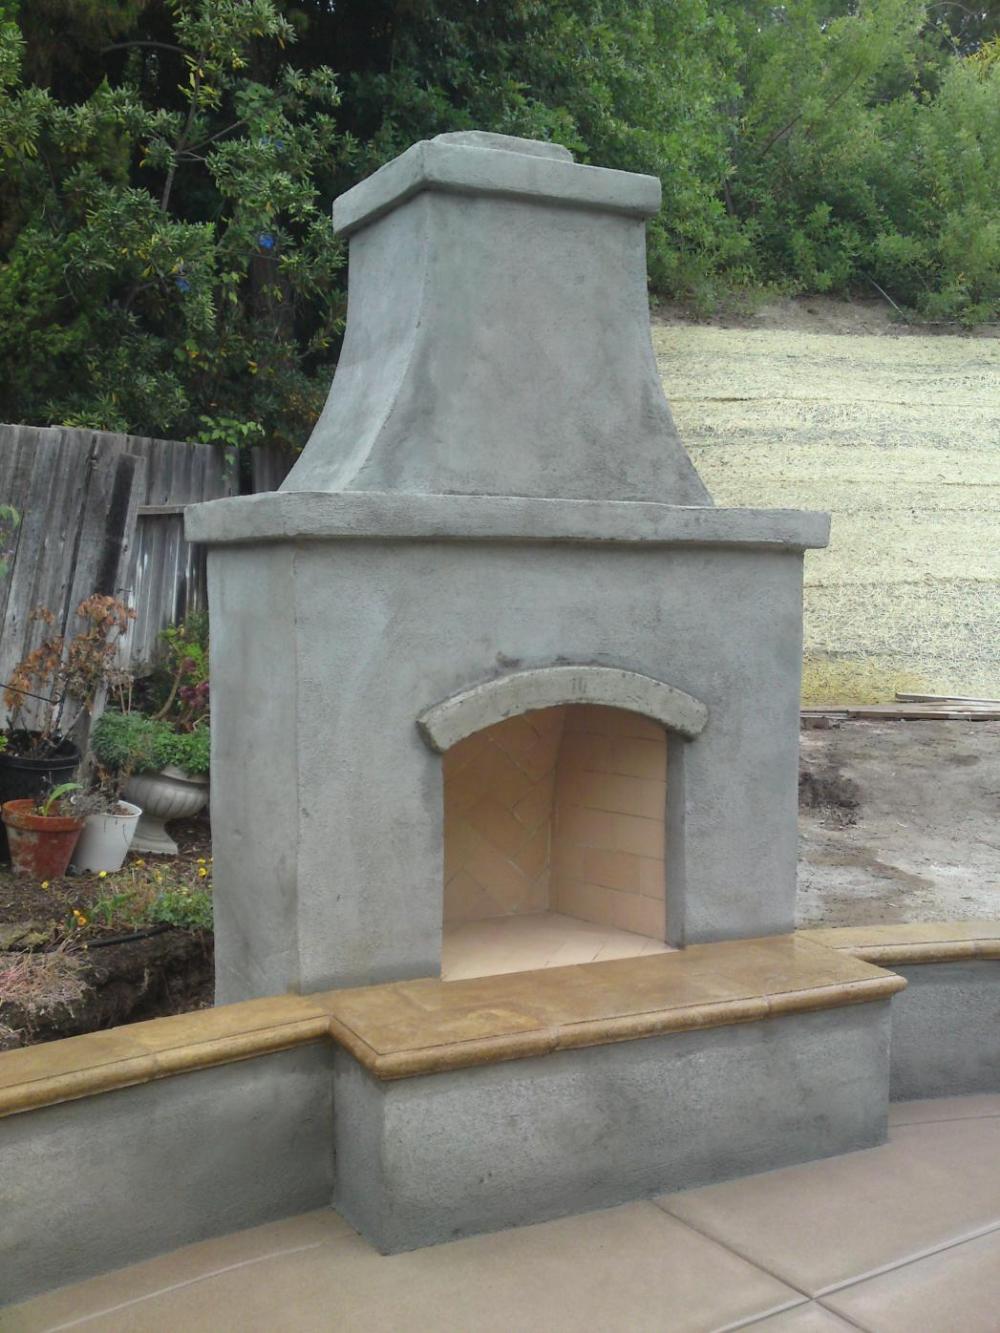 Prefab Outdoor Fireplace Design Ideas Msp Design Show Build Prefab Outdoor Fireplace Backyard Fireplace Outdoor Fireplace Outdoor Fireplace Kits